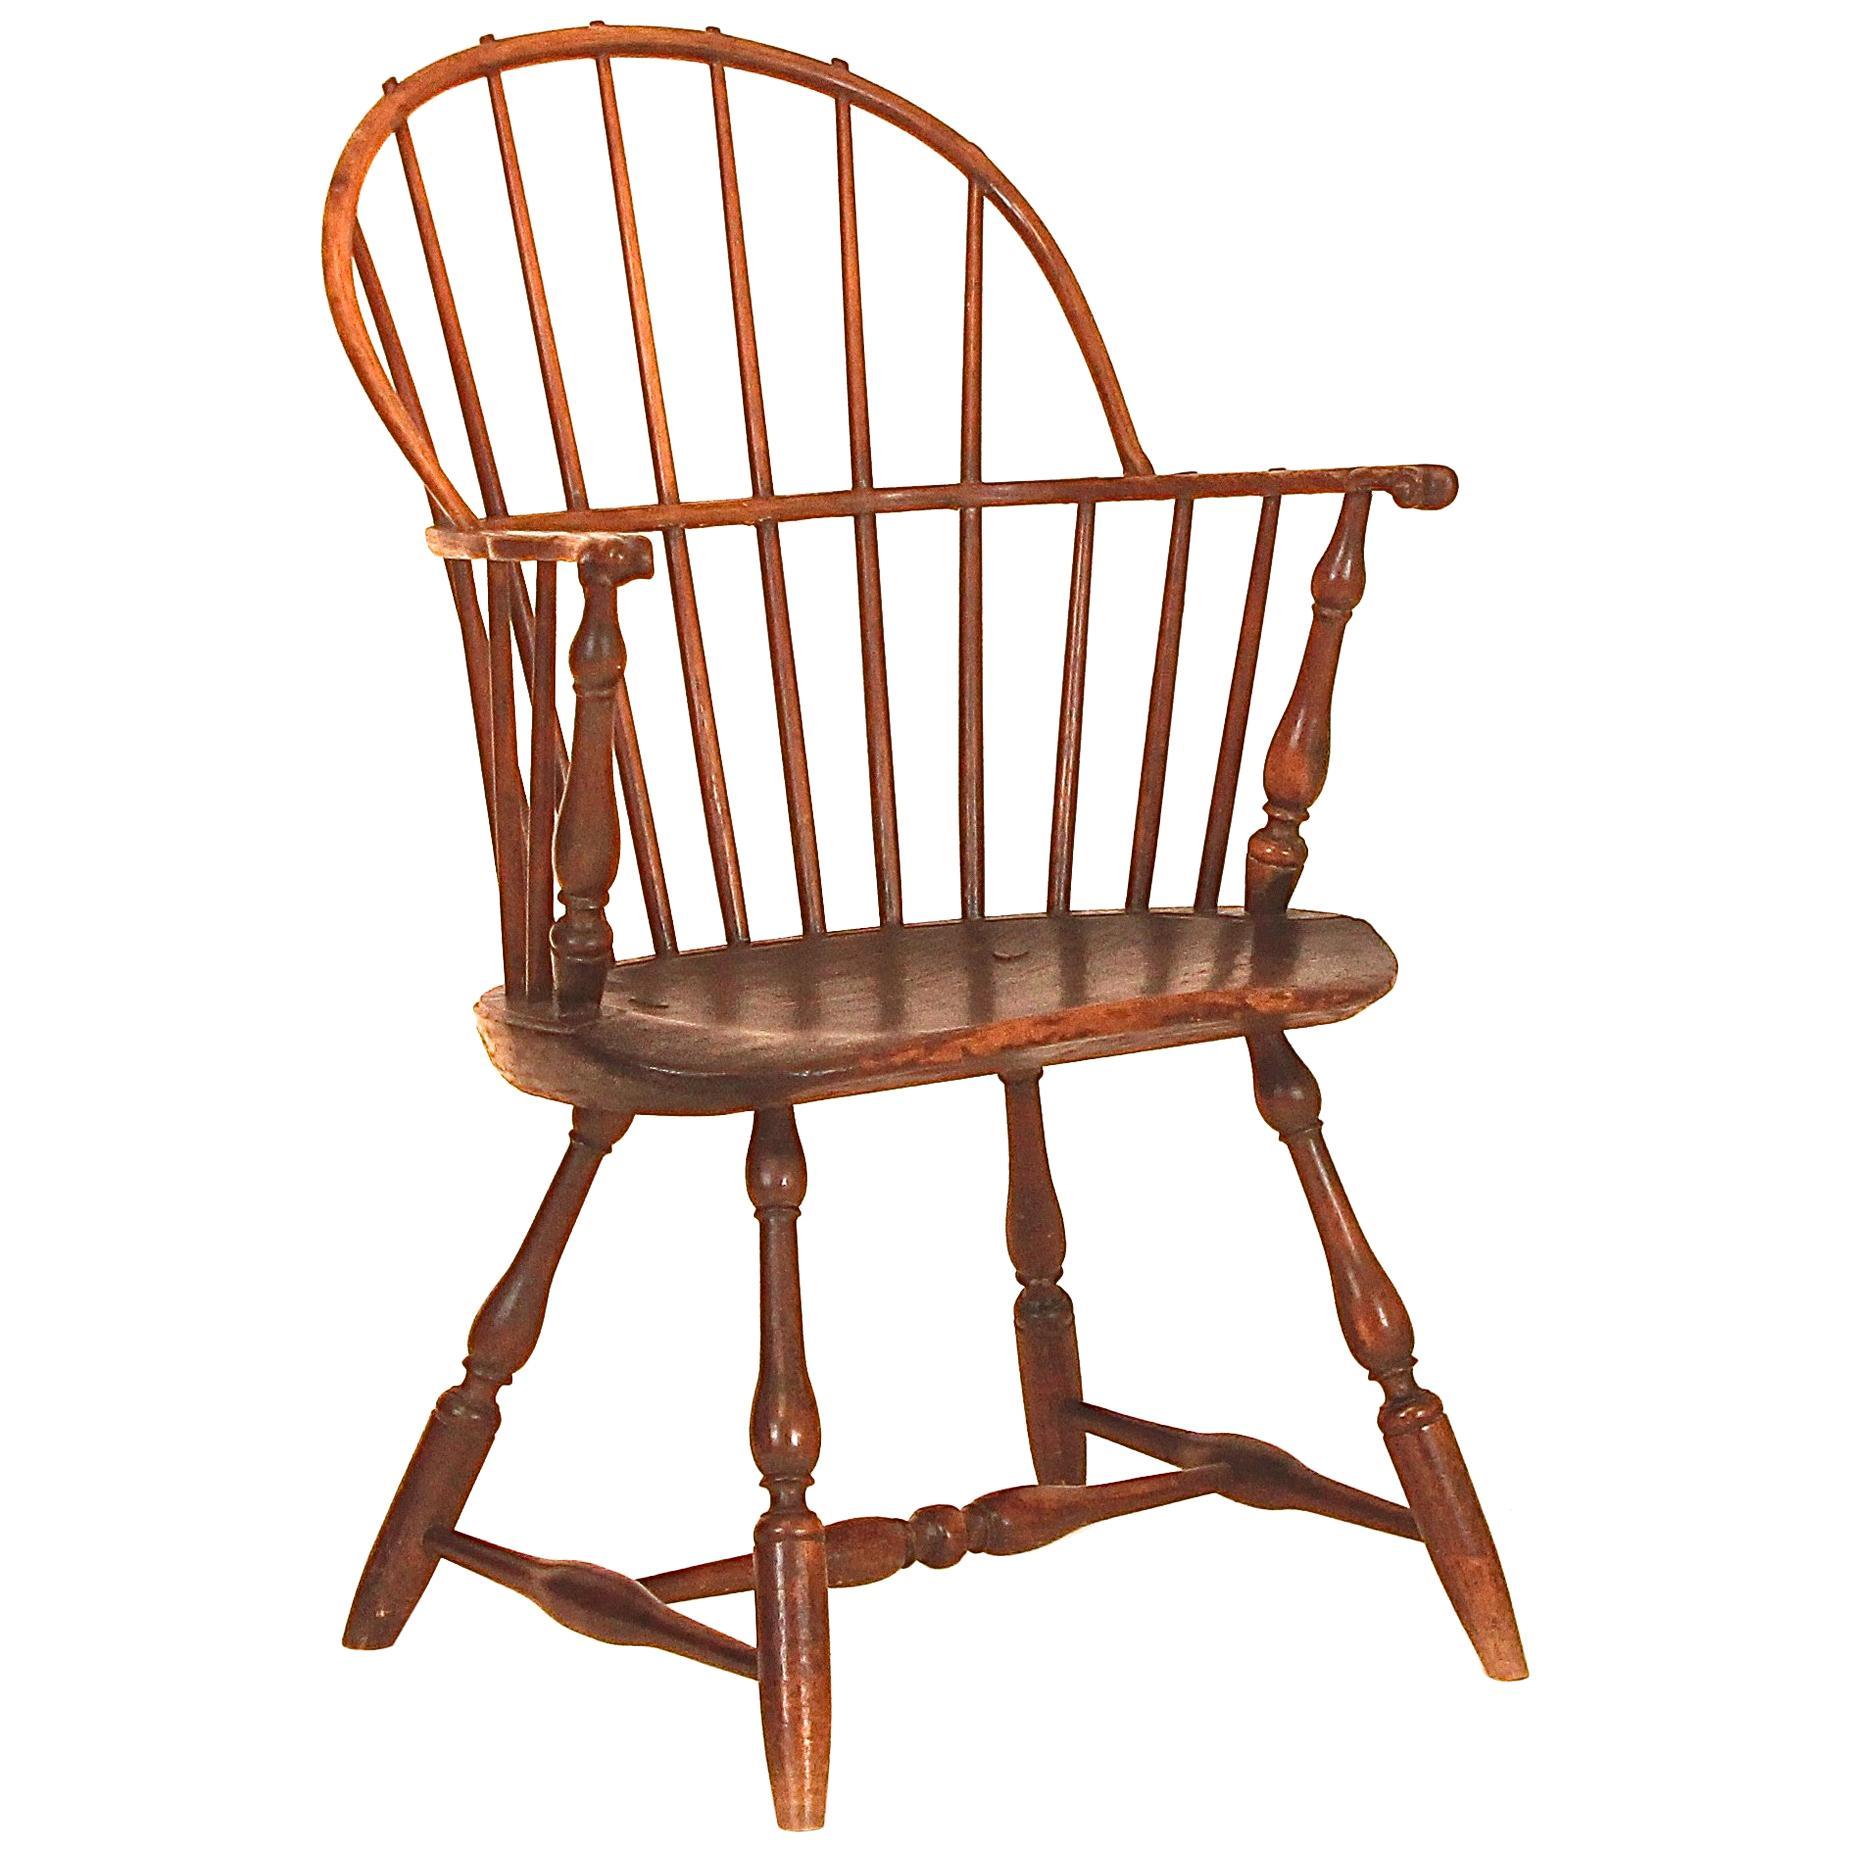 Rare Maple Low Back Windsor Armchair, Rhode Island, Circa 1760